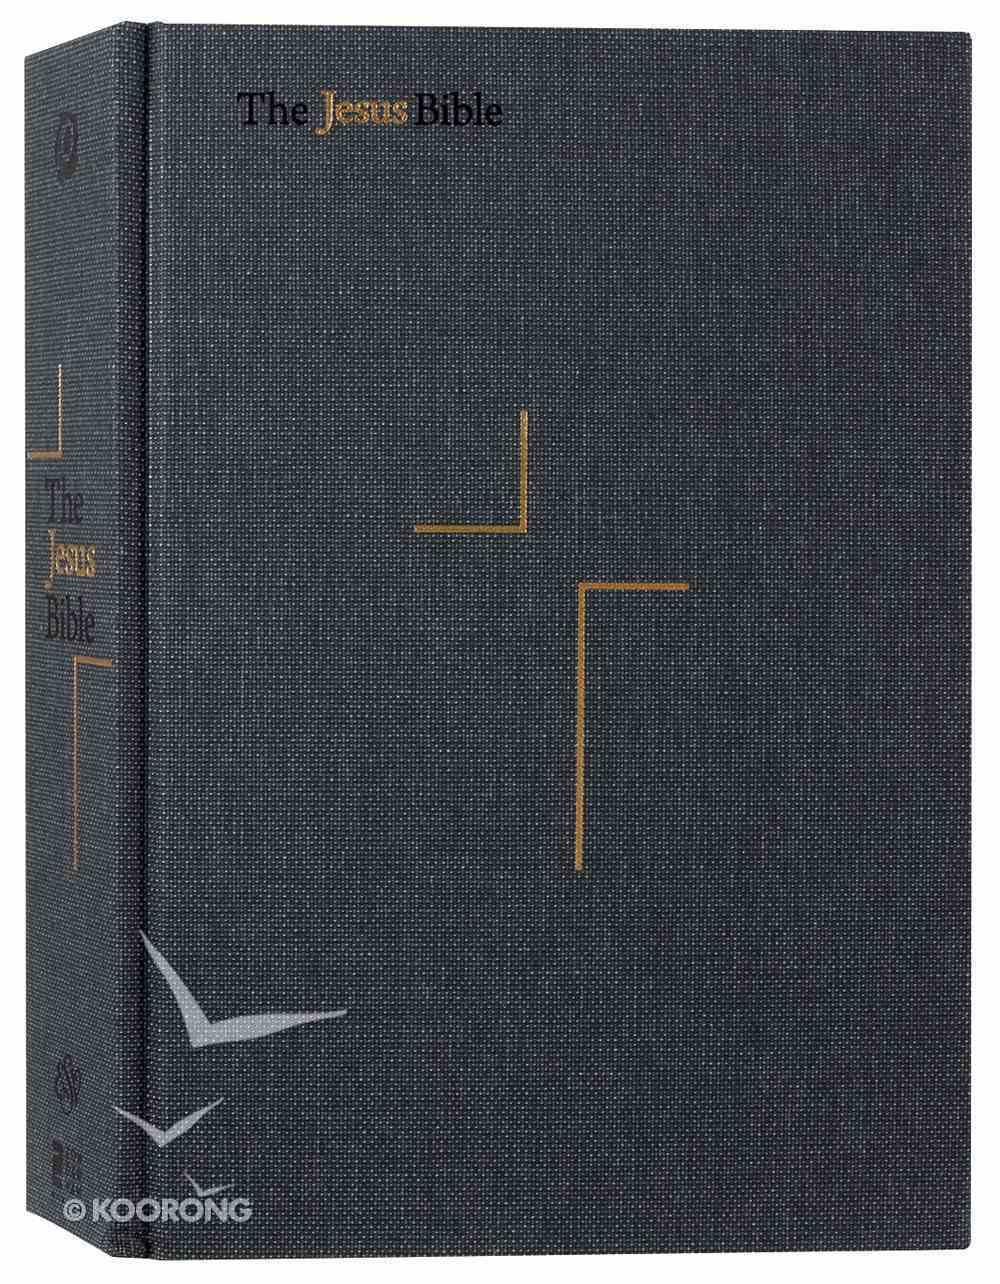 ESV the Jesus Bible Charcoal Fabric Over Hardback